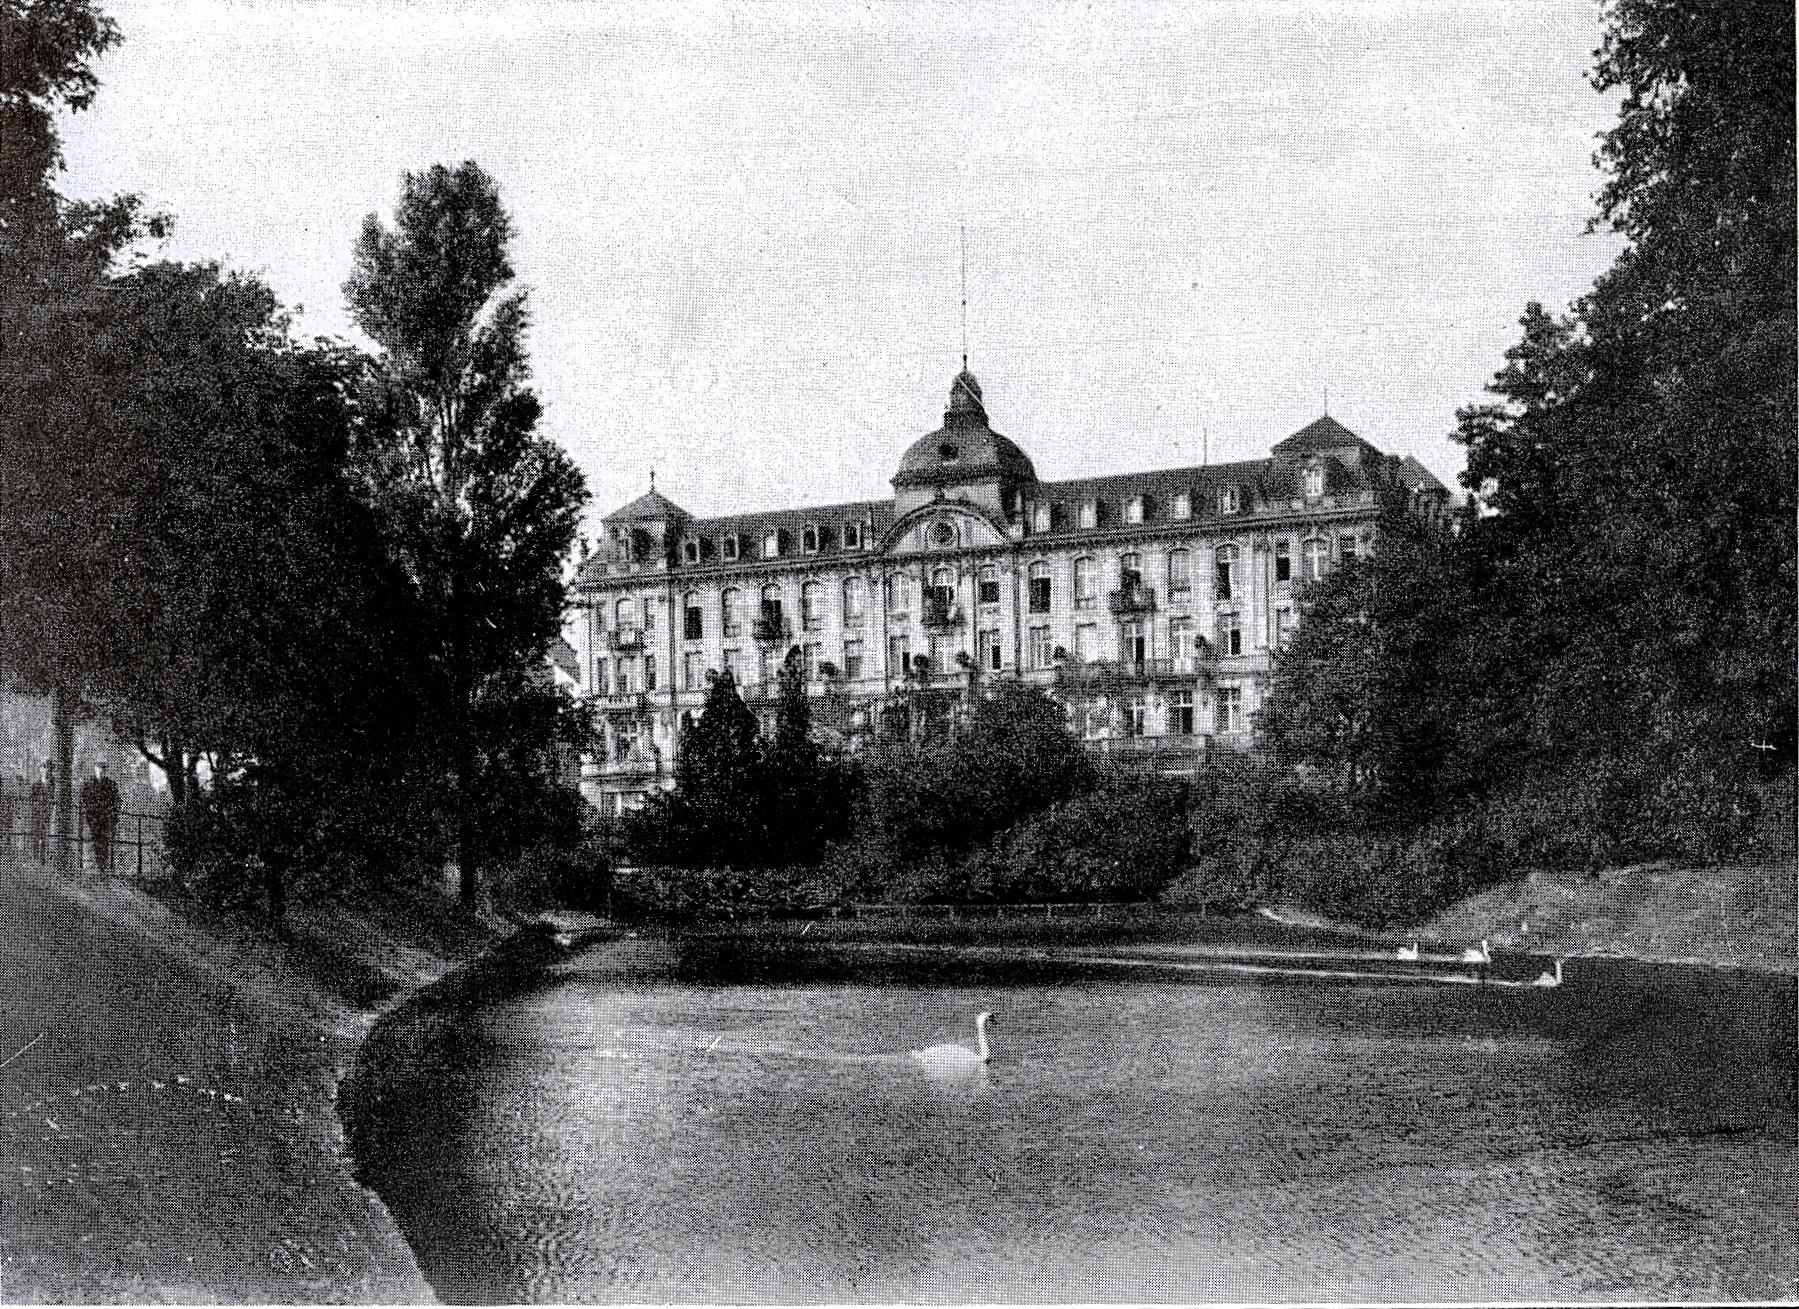 Parkhotel Düsseldorf, where the speech was held.